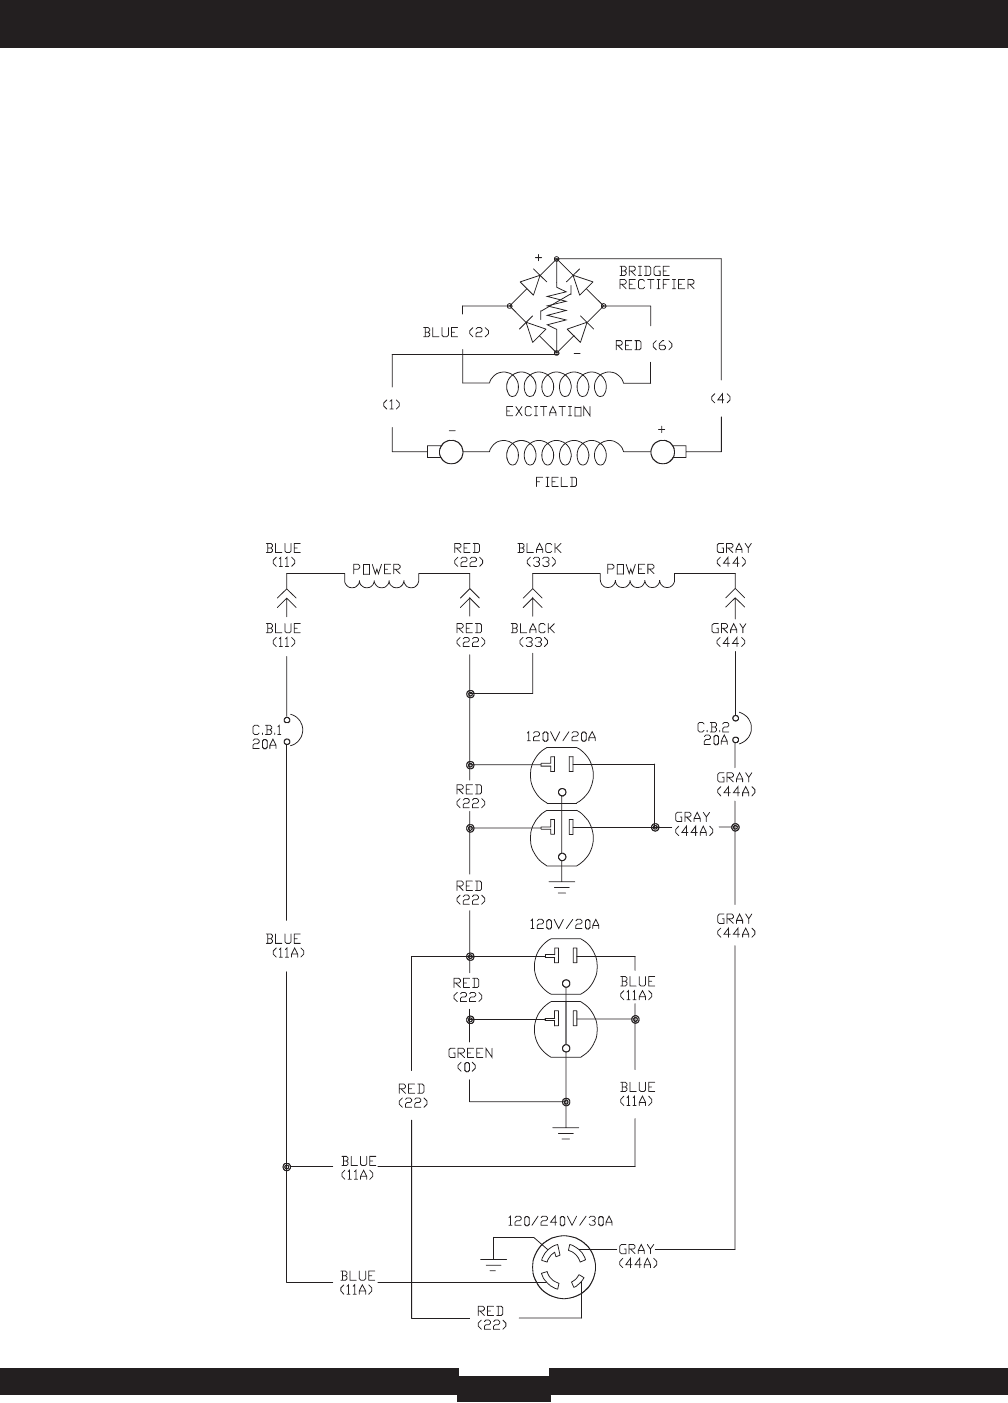 030209 2wds 030209 2 5500 Watt Portable Generator Briggs Stratton Generac Electrical Wiring Diagram